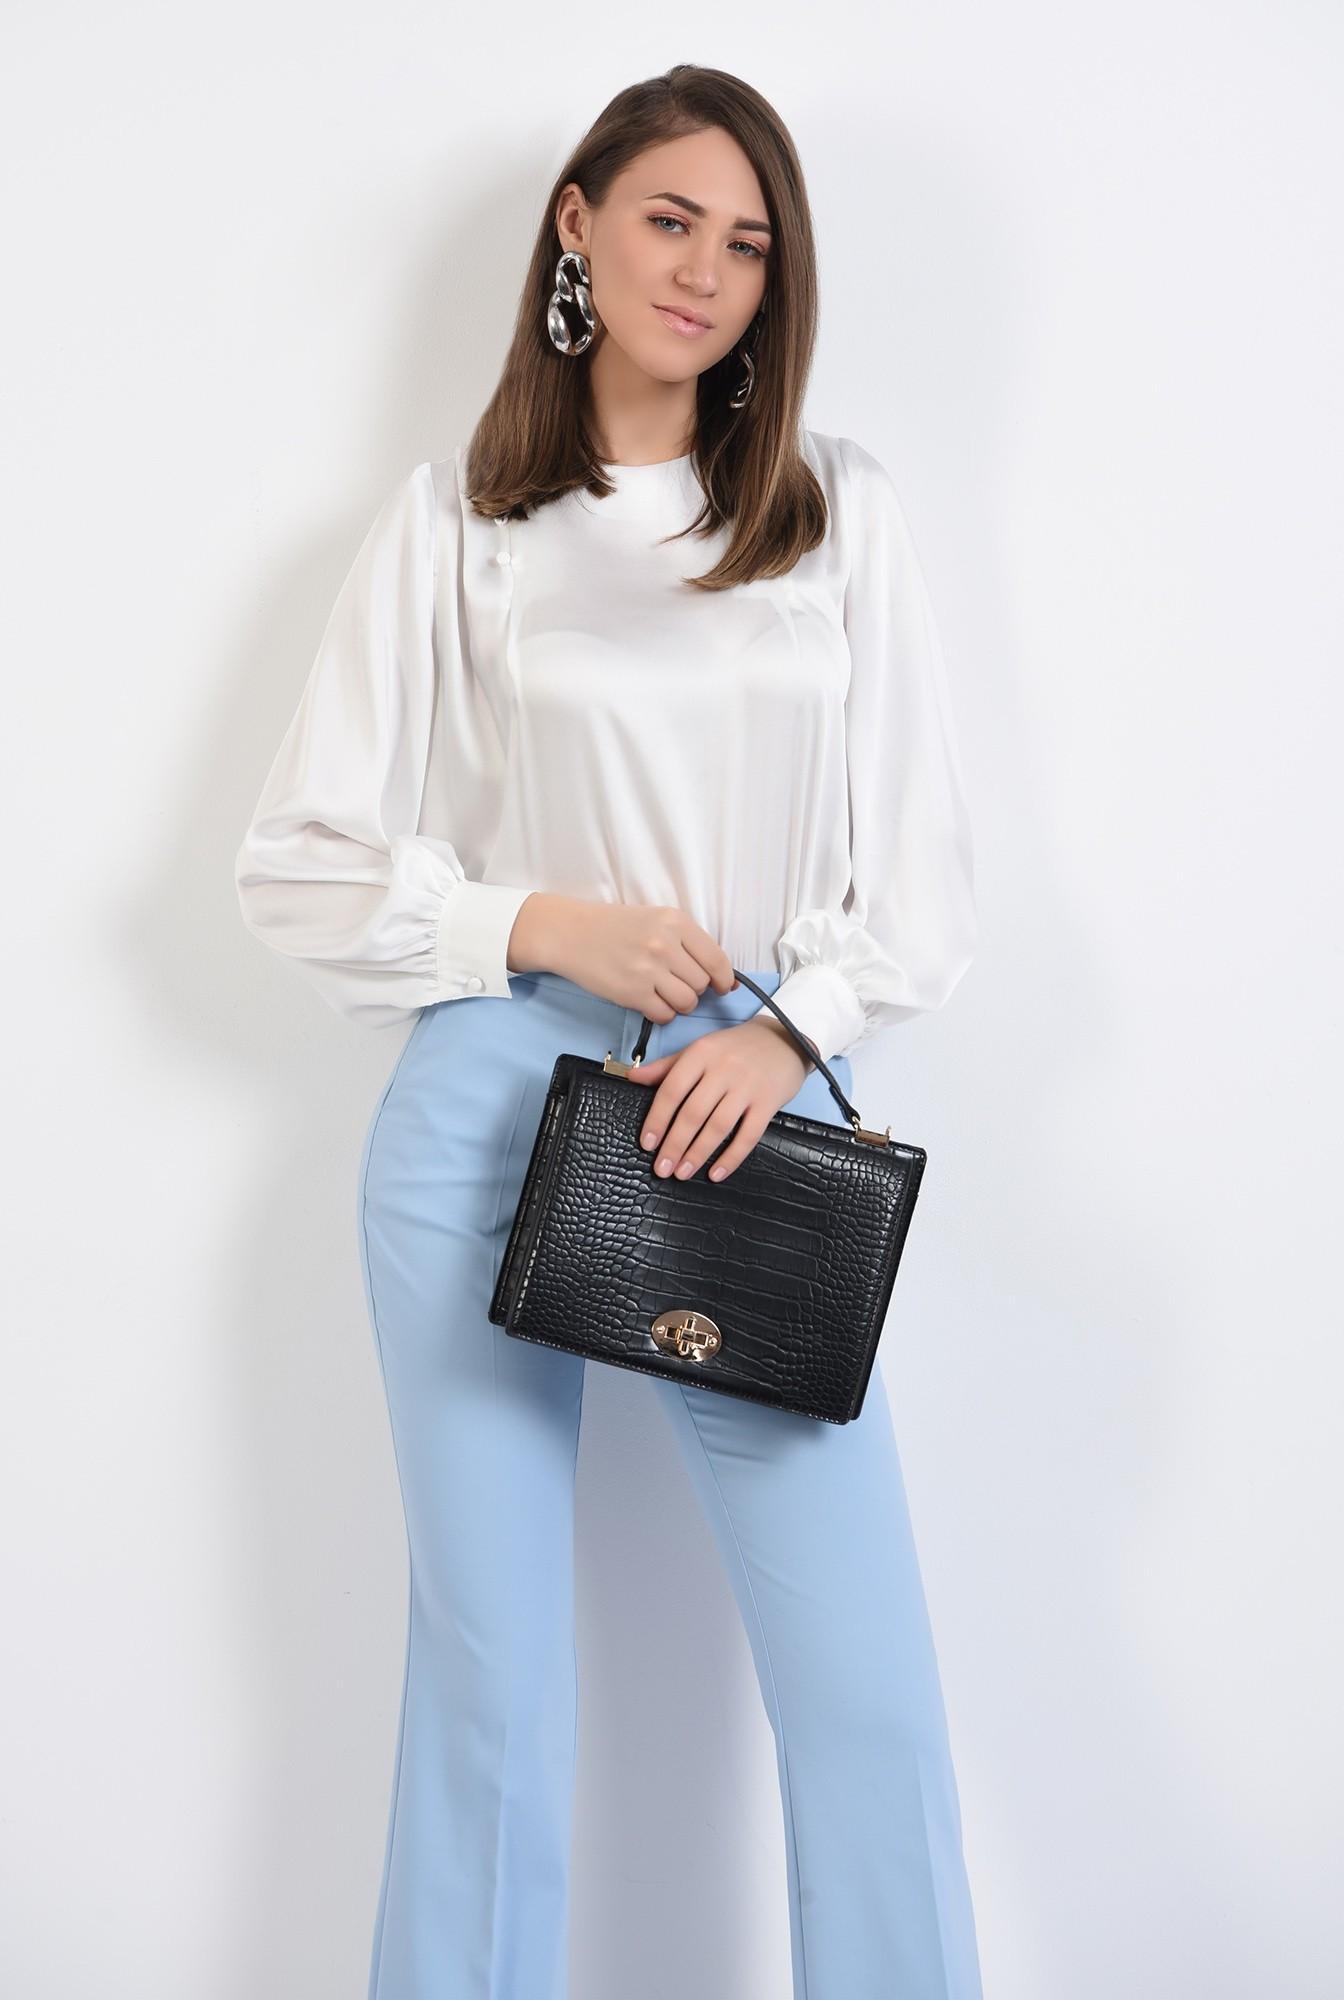 0 -  bluza eleganta, cu nasturi decorativi, maneci lungi, din satin